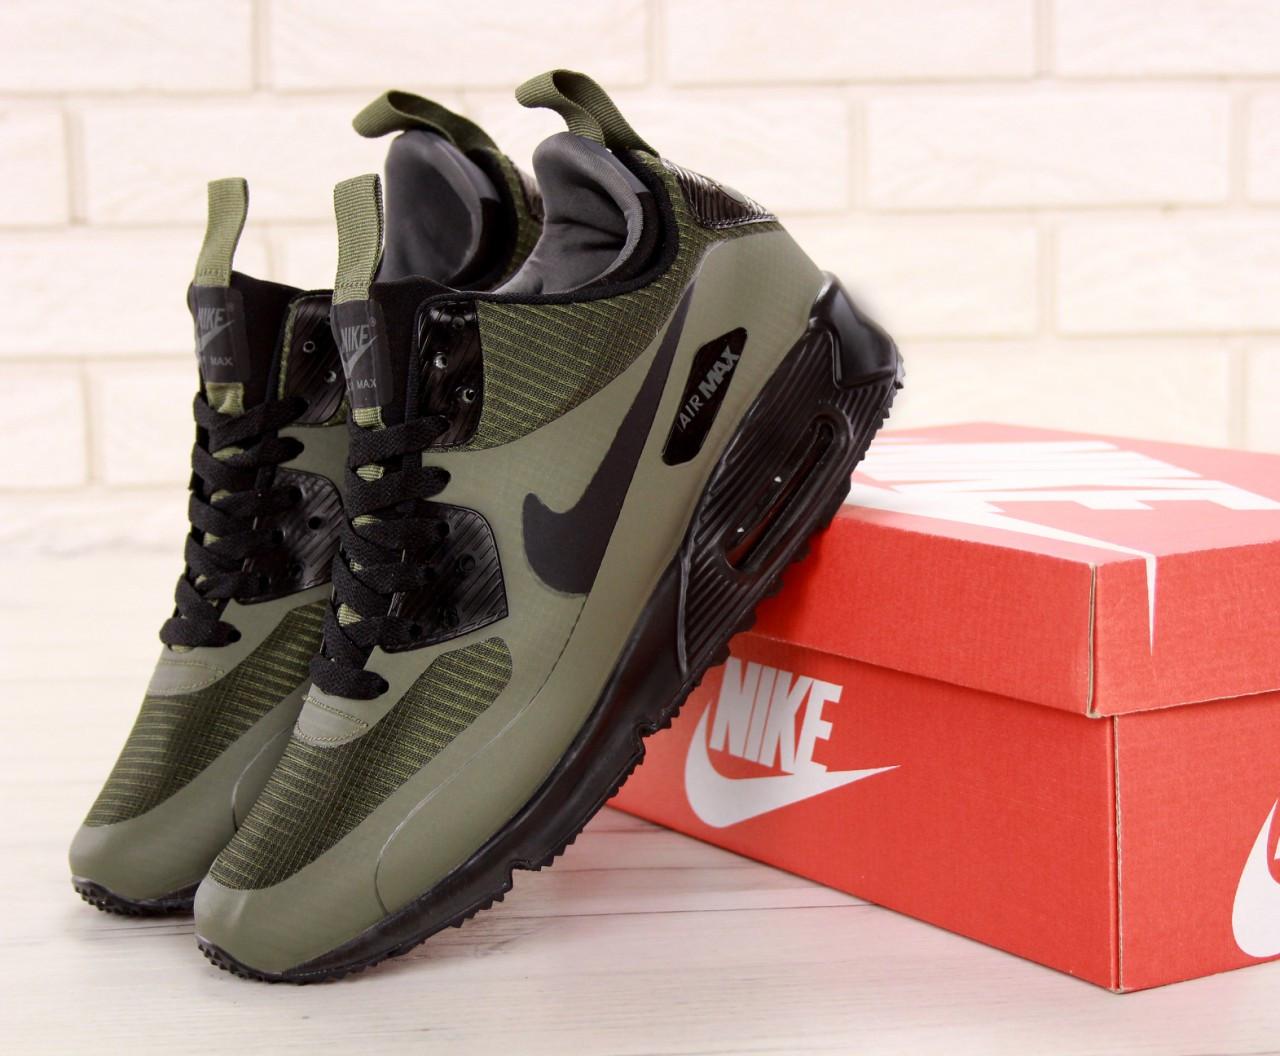 Мужские зимние кроссовки Nike Air Max 90 Mid Winter Green на термо подкладке